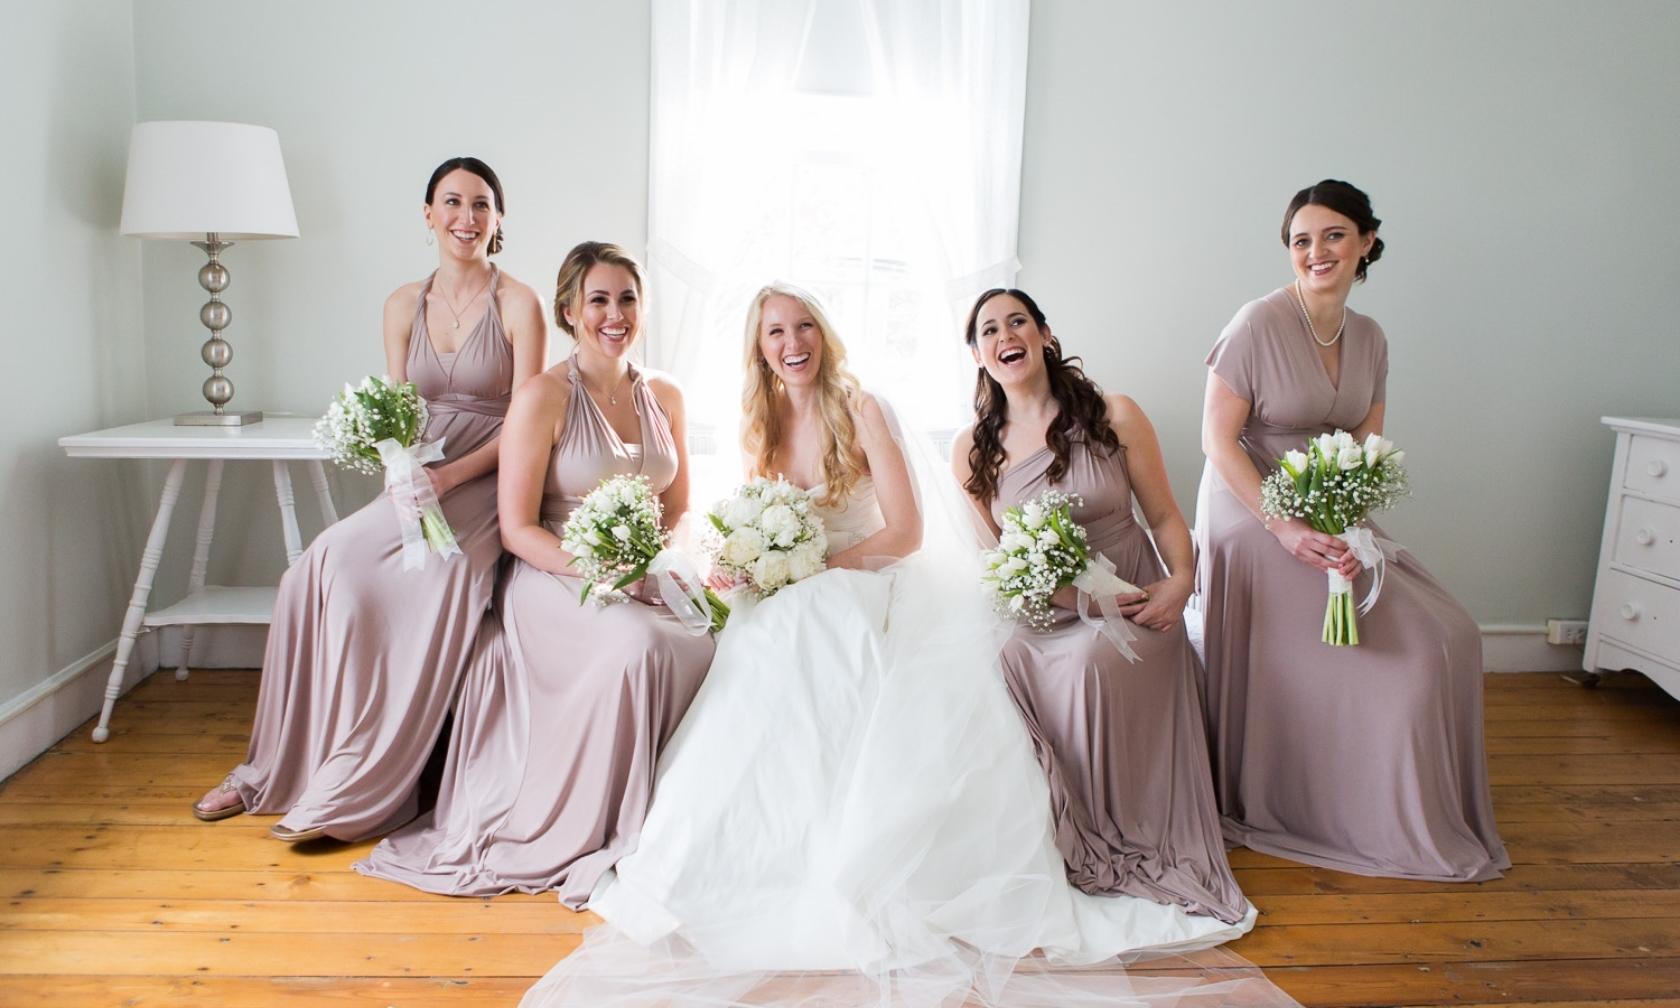 Kristi-Drago-Price-Owenego-Wedding-16.jpg